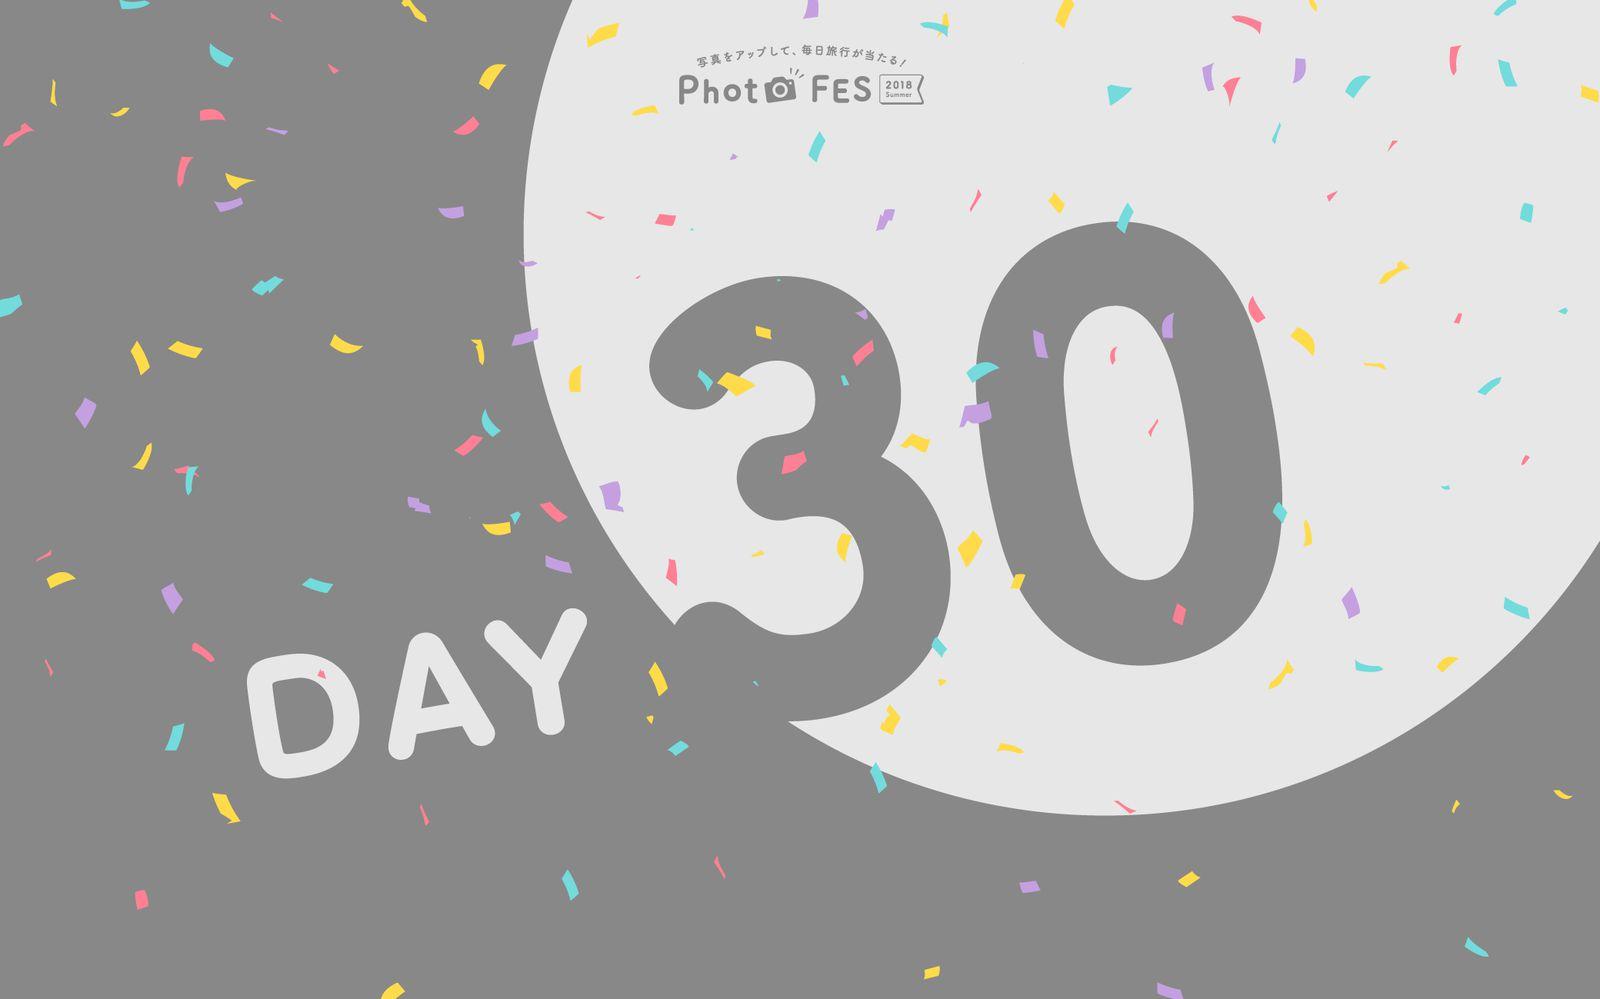 【DAY30】「Photo FES 2018」7月25日投稿分であたる賞品&受賞者発表